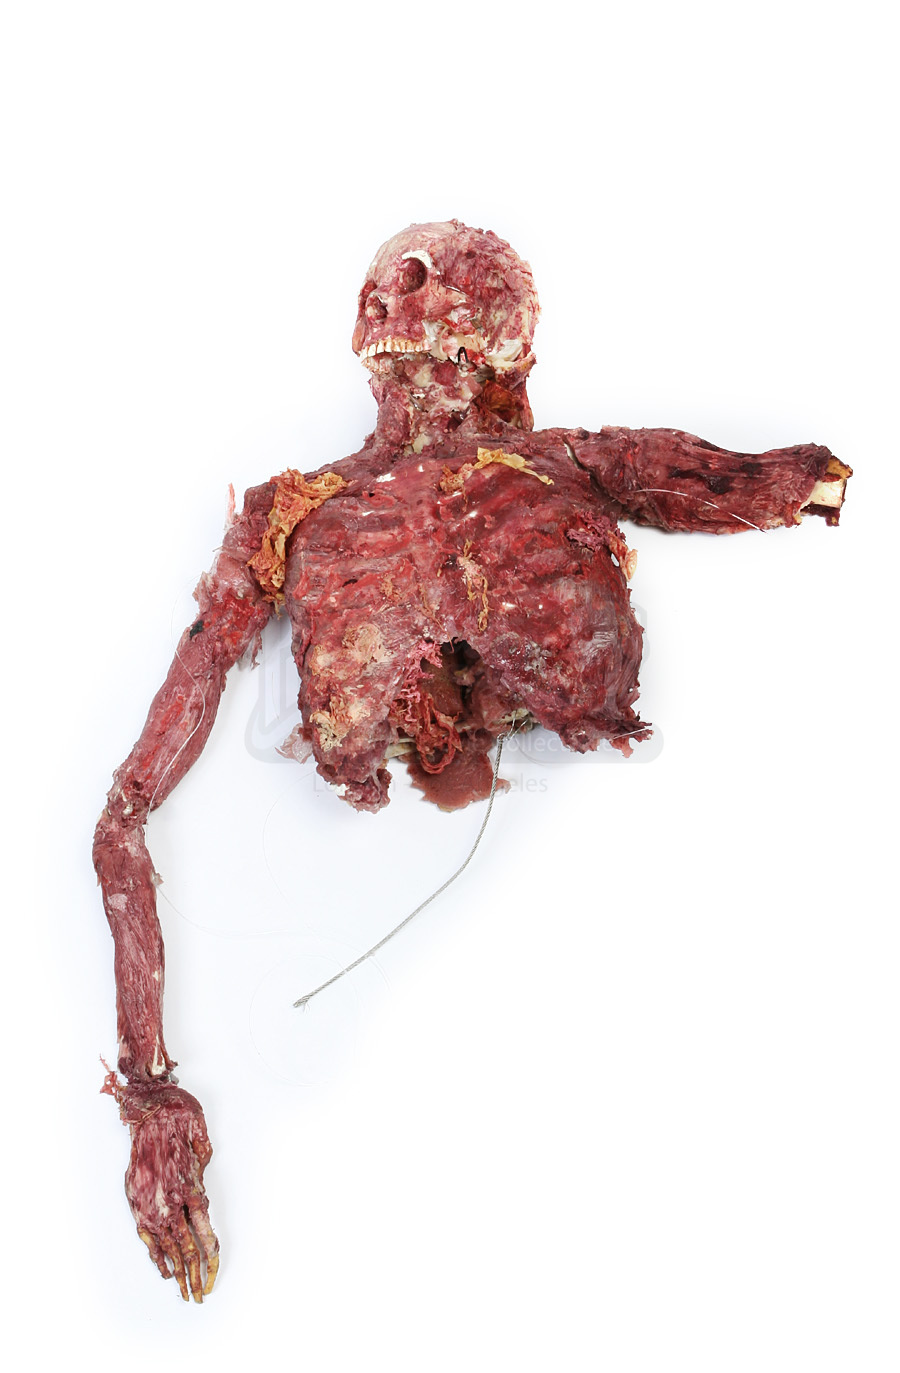 eye-gouged victims upper body